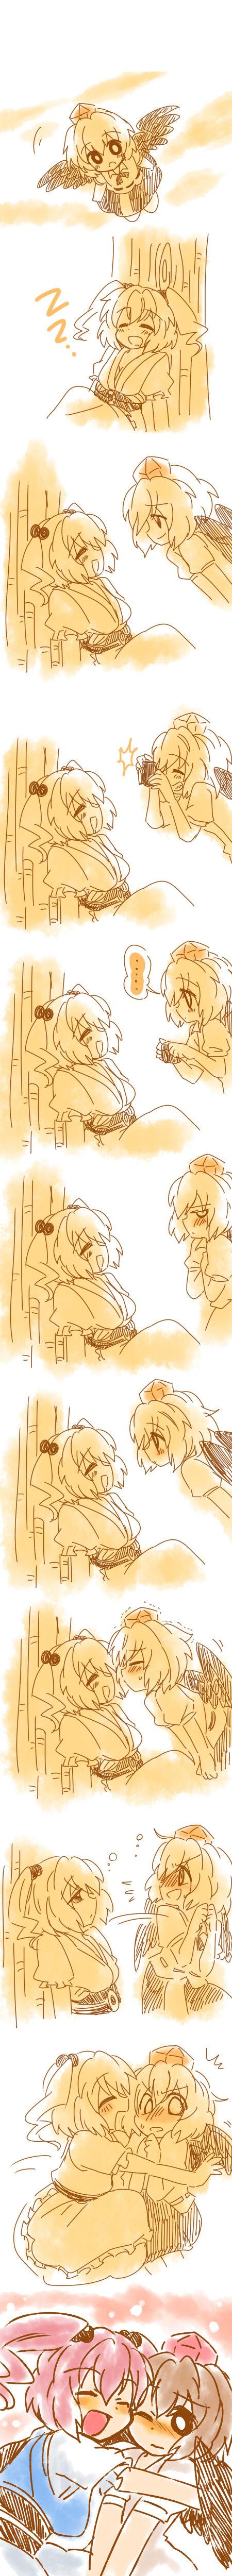 onozuka komachi and shameimaru aya (touhou) drawn by eromame